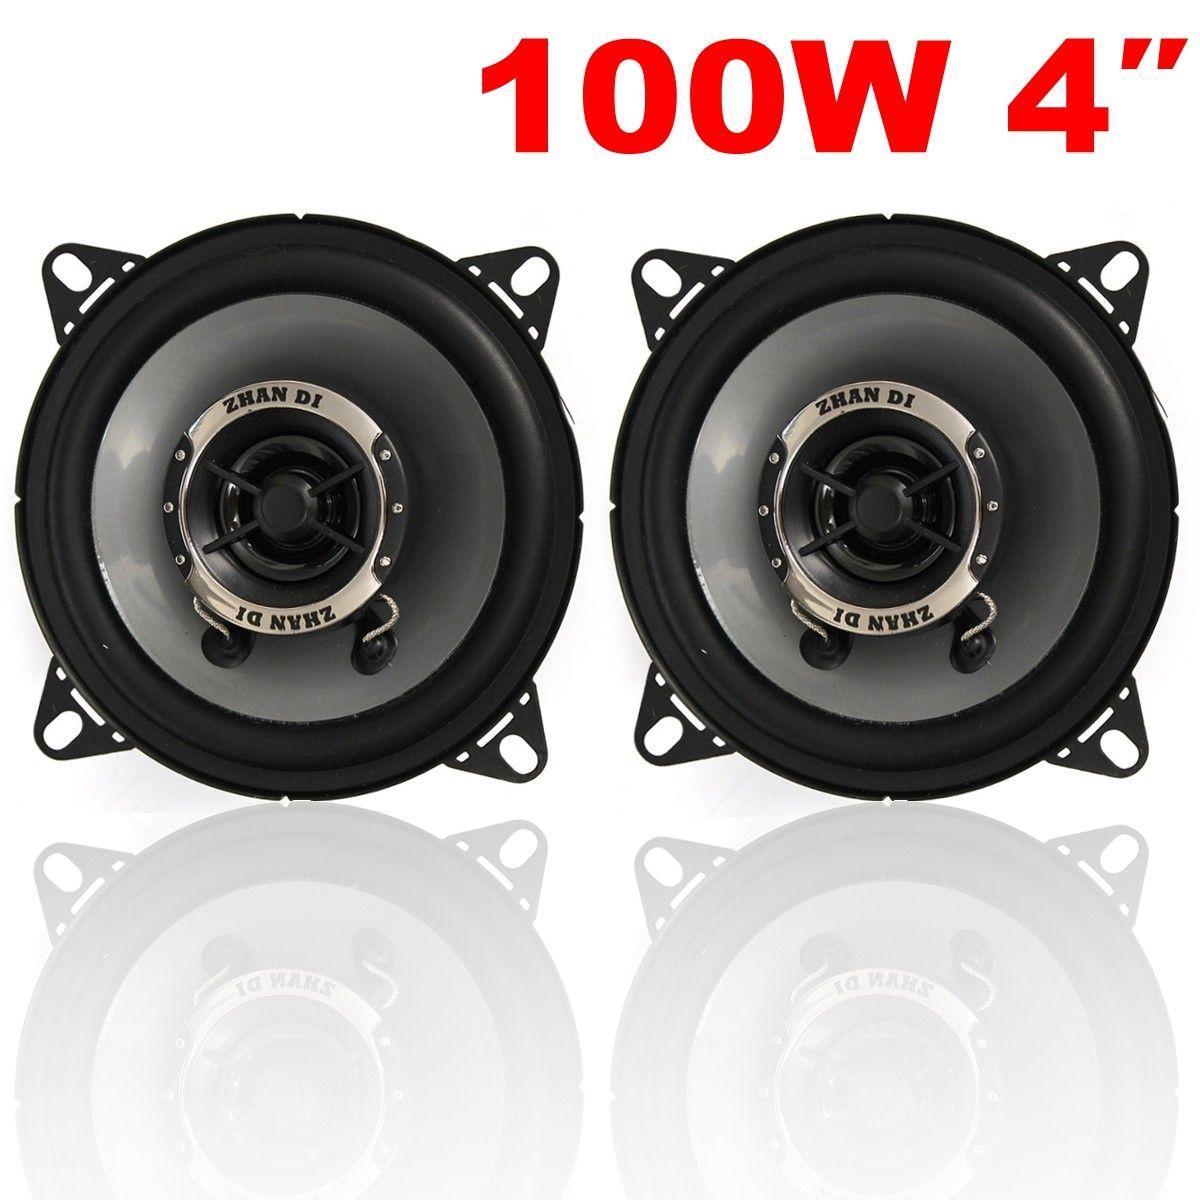 KROAK 2PCS 4 Inch 10cm Car Coaxial Speakers /Car Tweeters Dual Cone Coaxial Car Van Front Rear Door Dash 240W